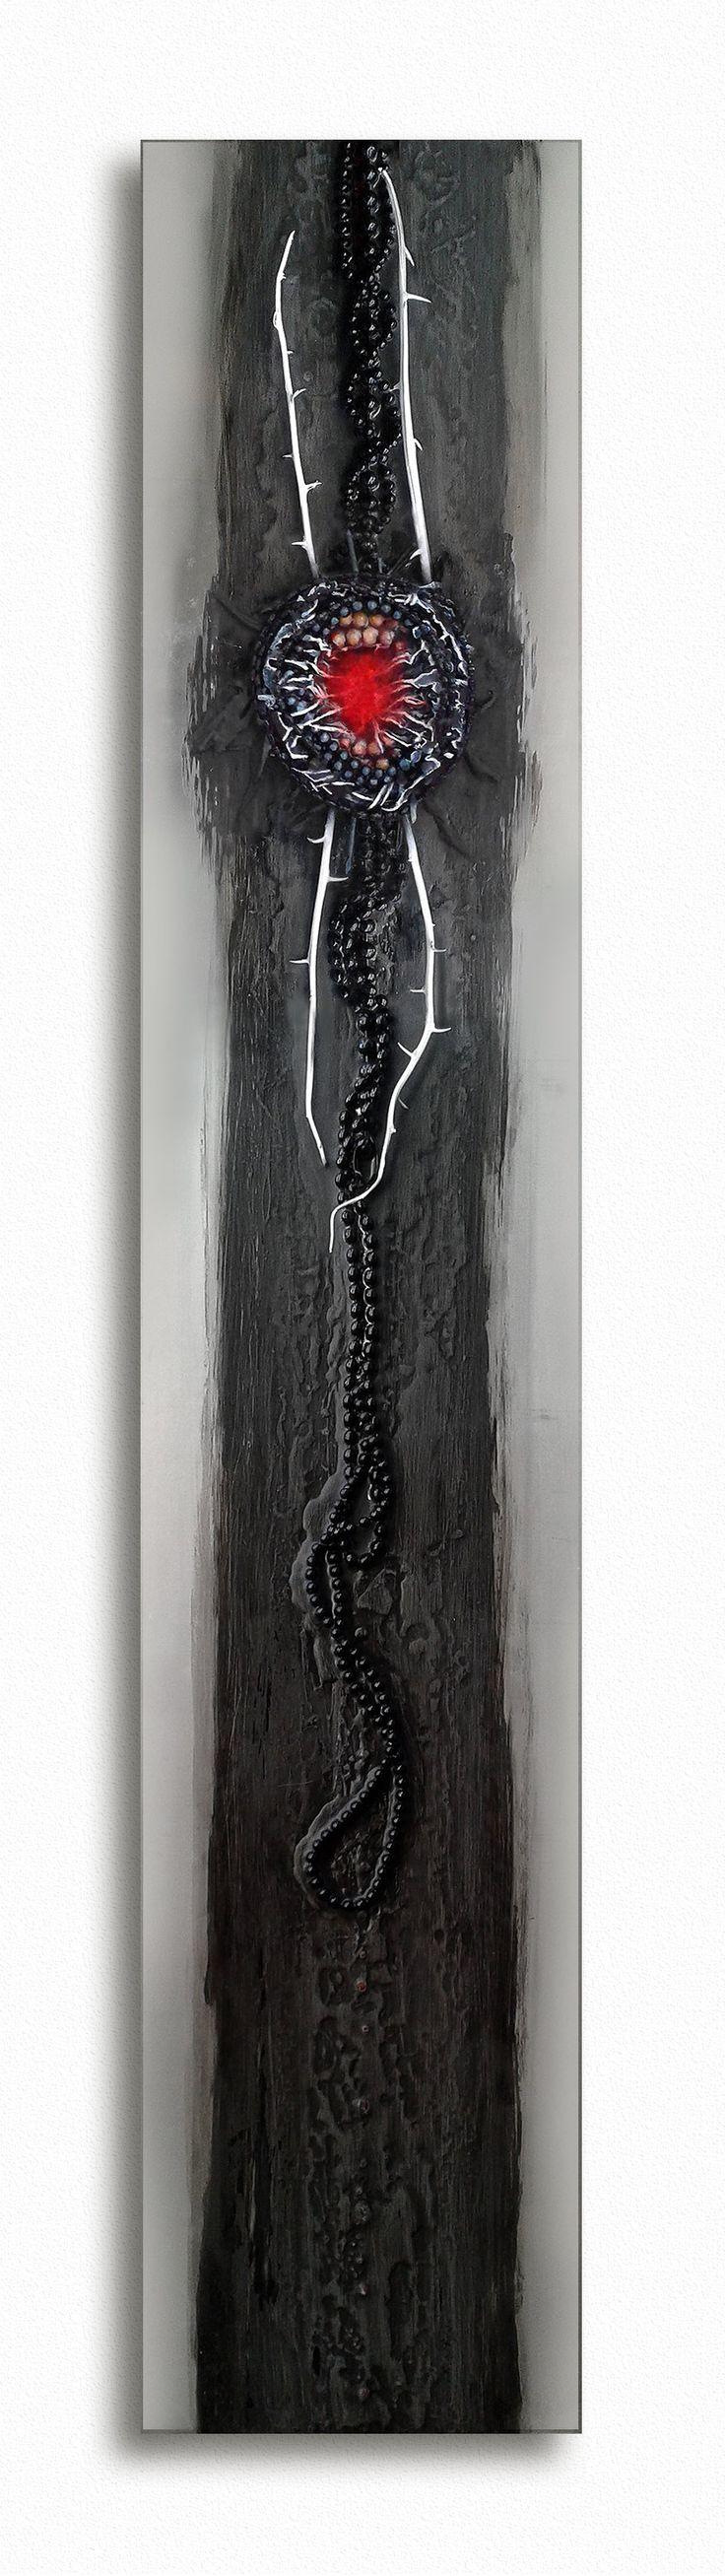 Carcosa (Halo Anaesthesia), 240 x 1250mm